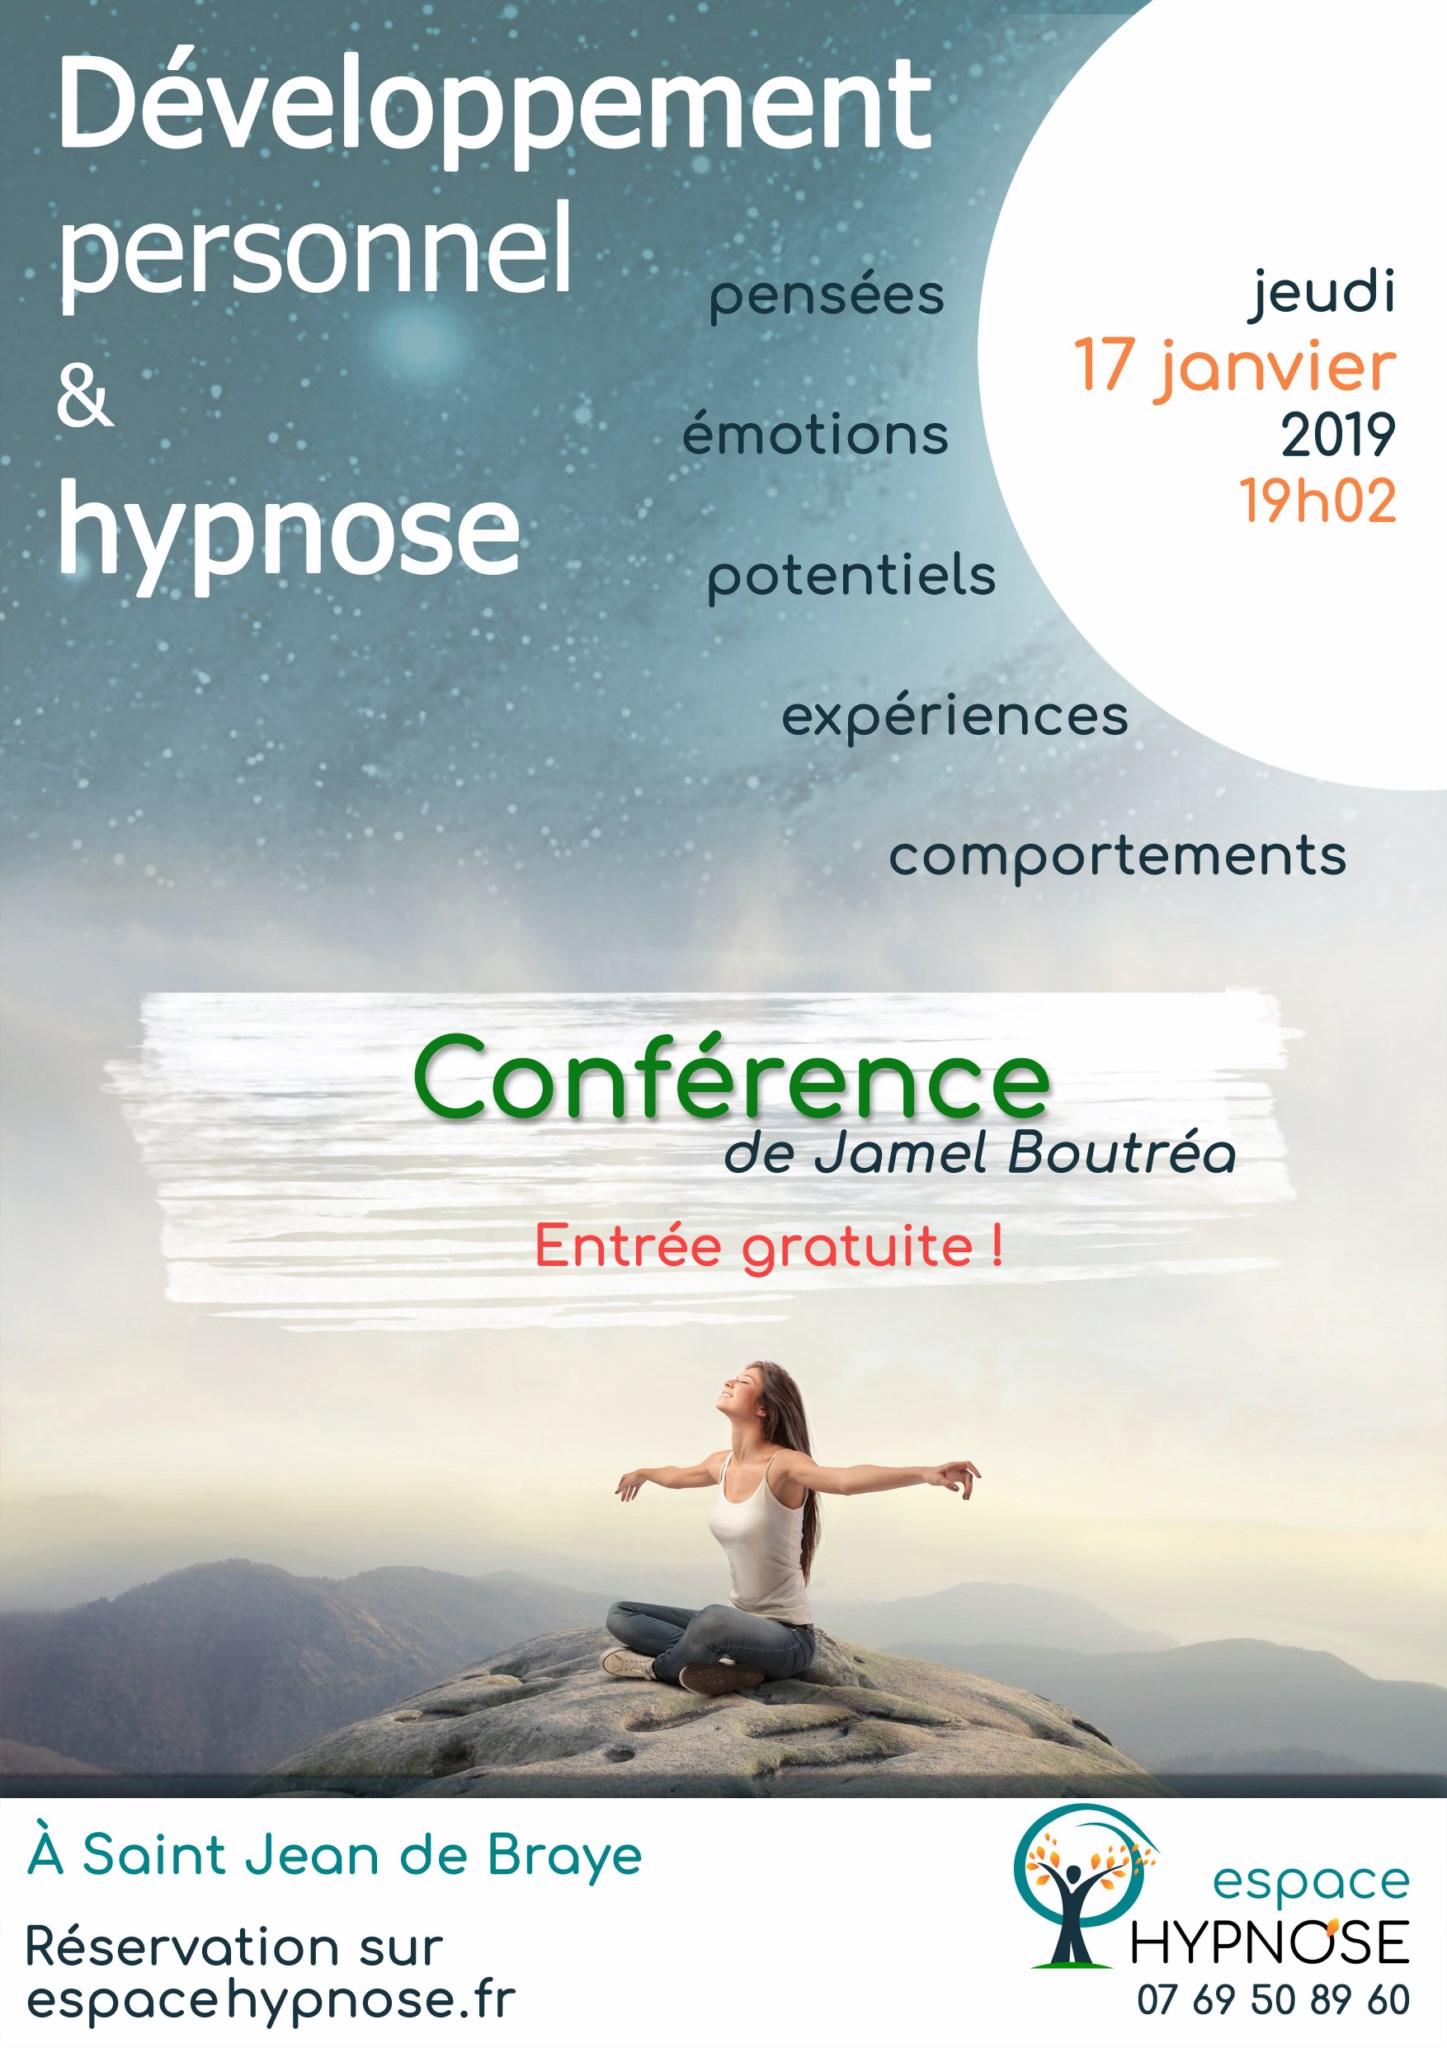 affiche-conference-jamel-boutréa-17-01-2019